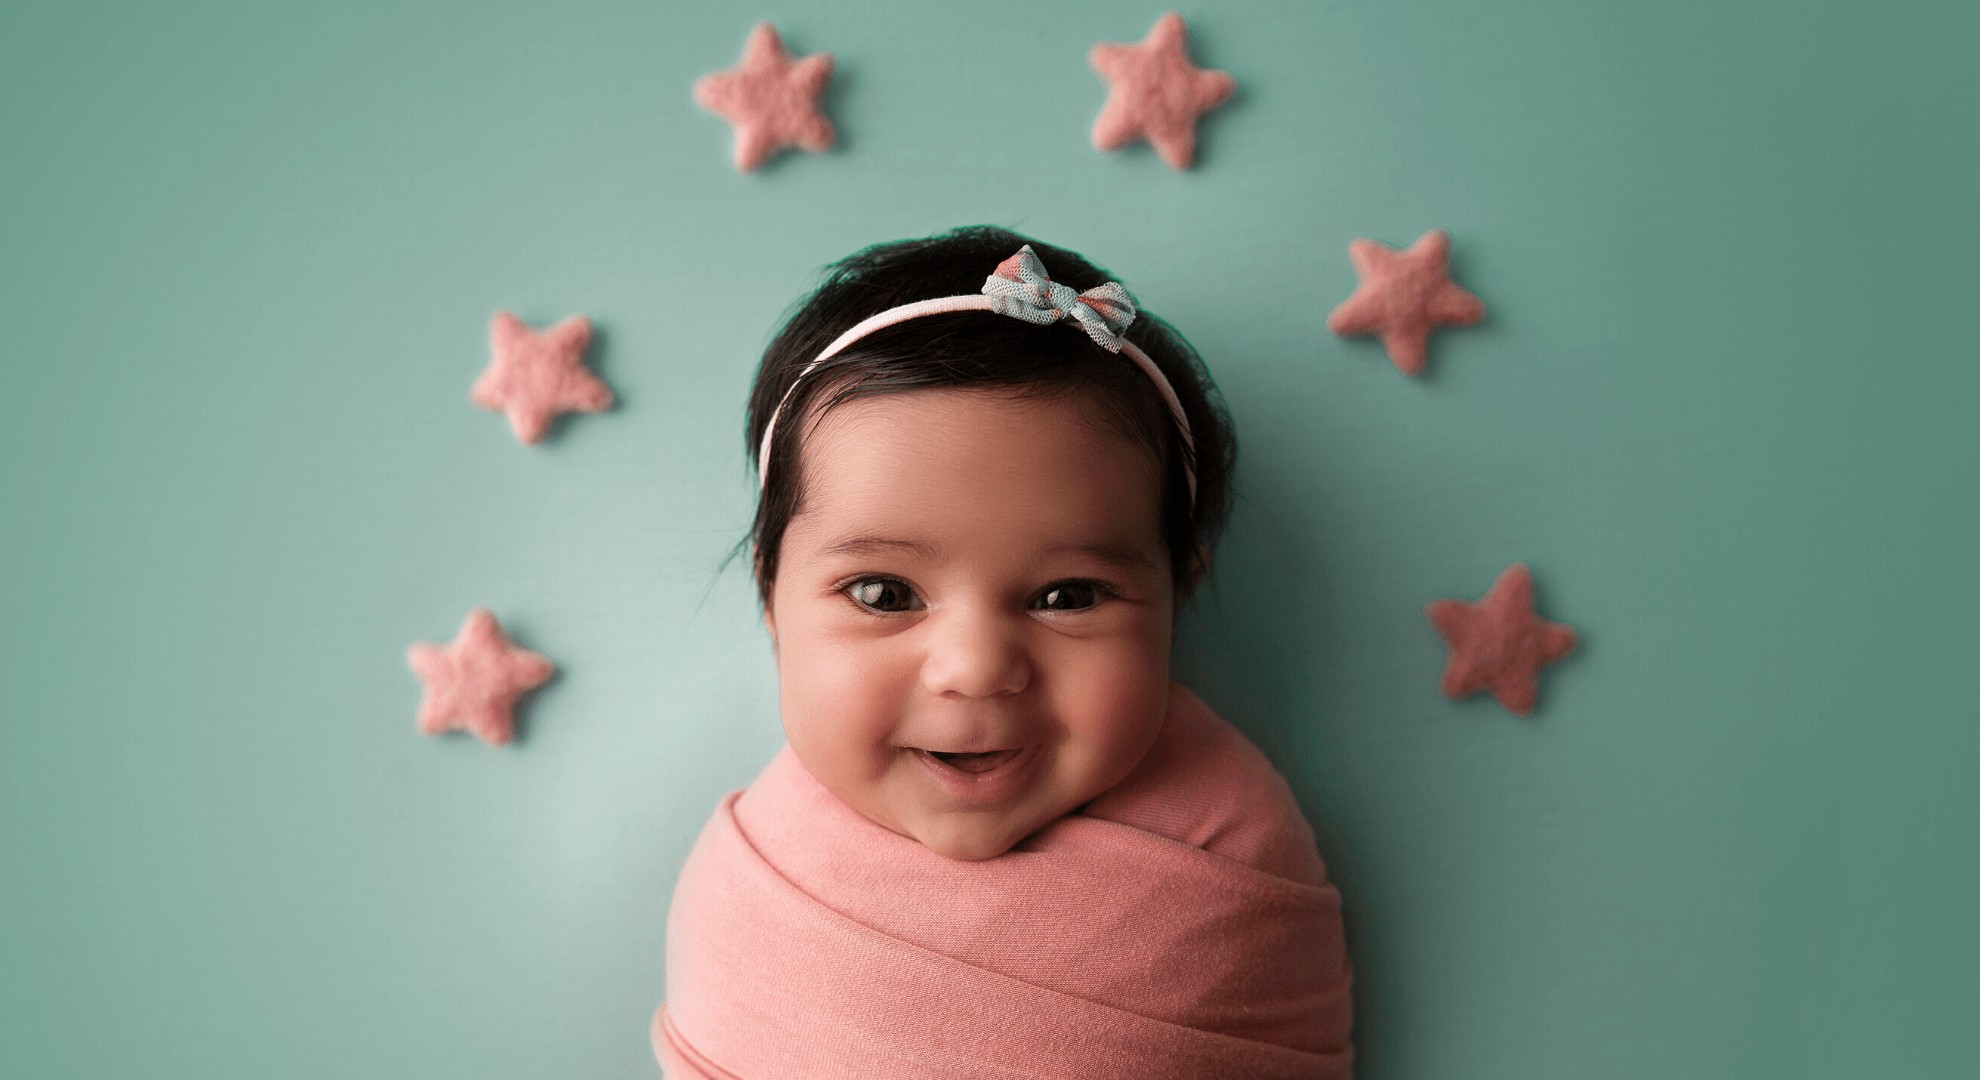 Newborn Photographers in London